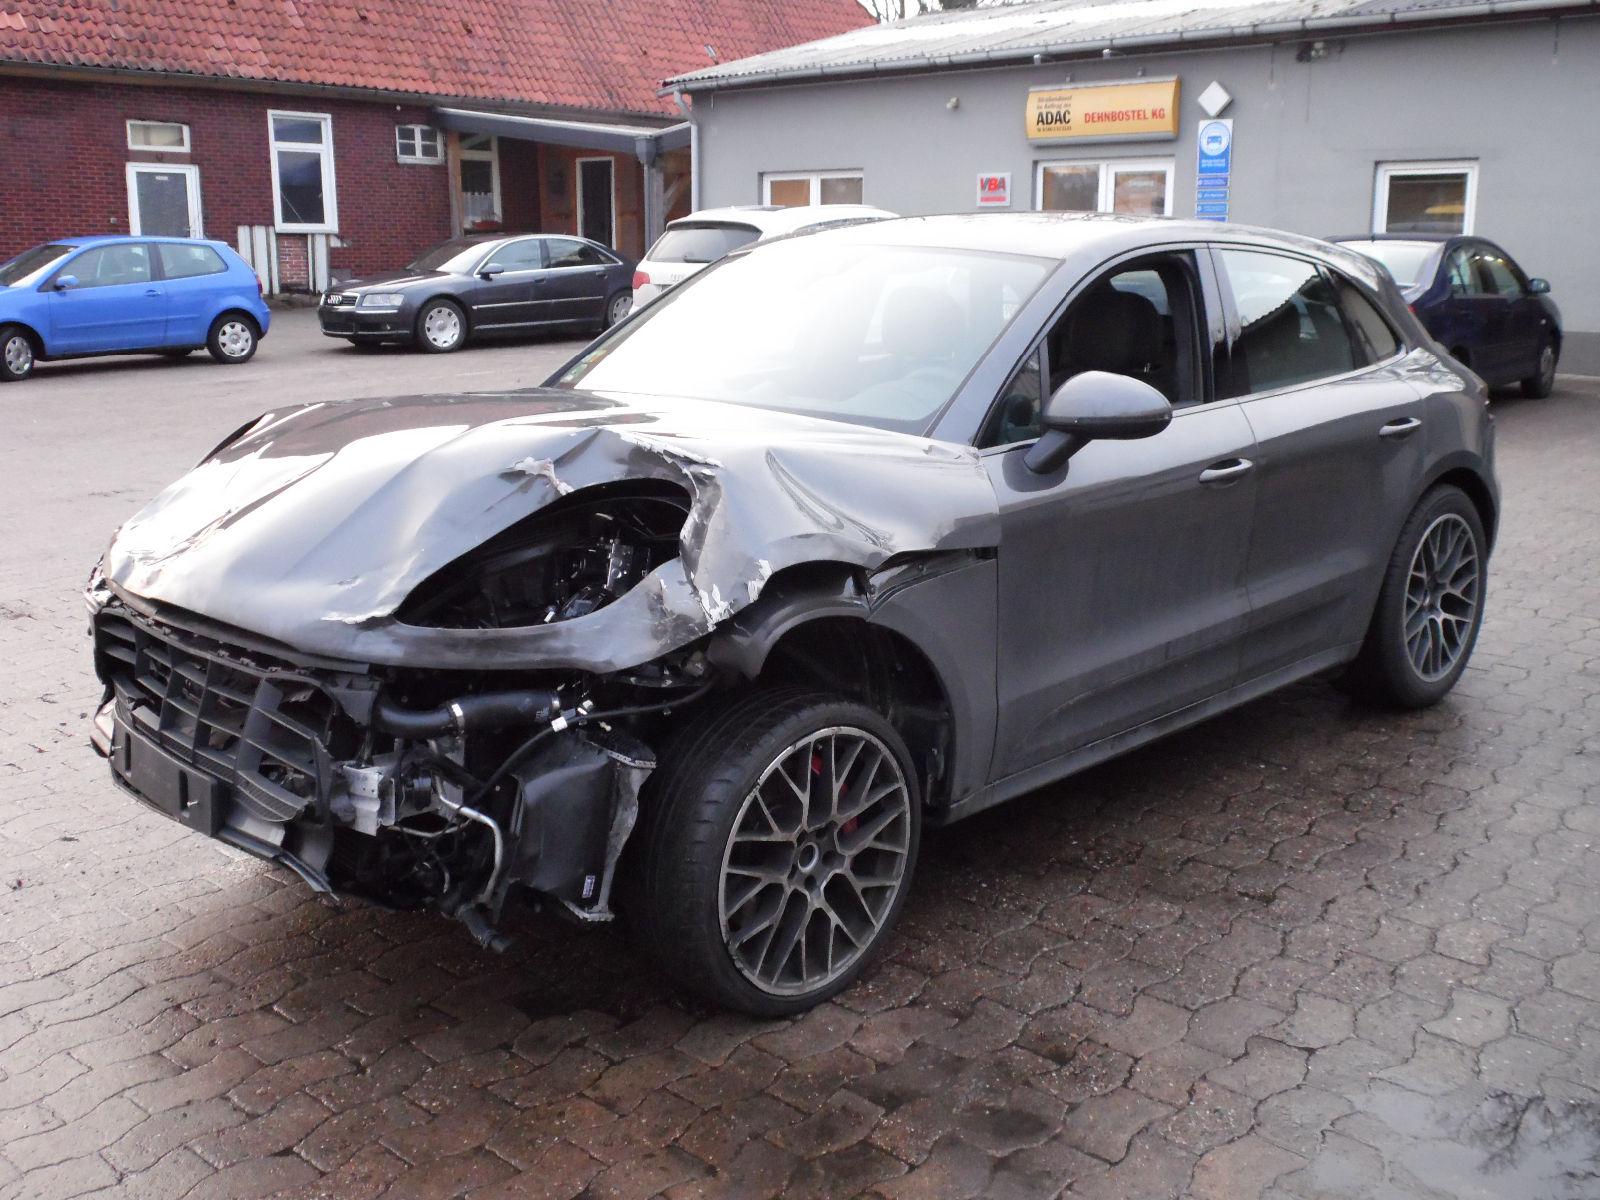 57 000 Damaged Porsche Macan Turbo Is Not A Bargain